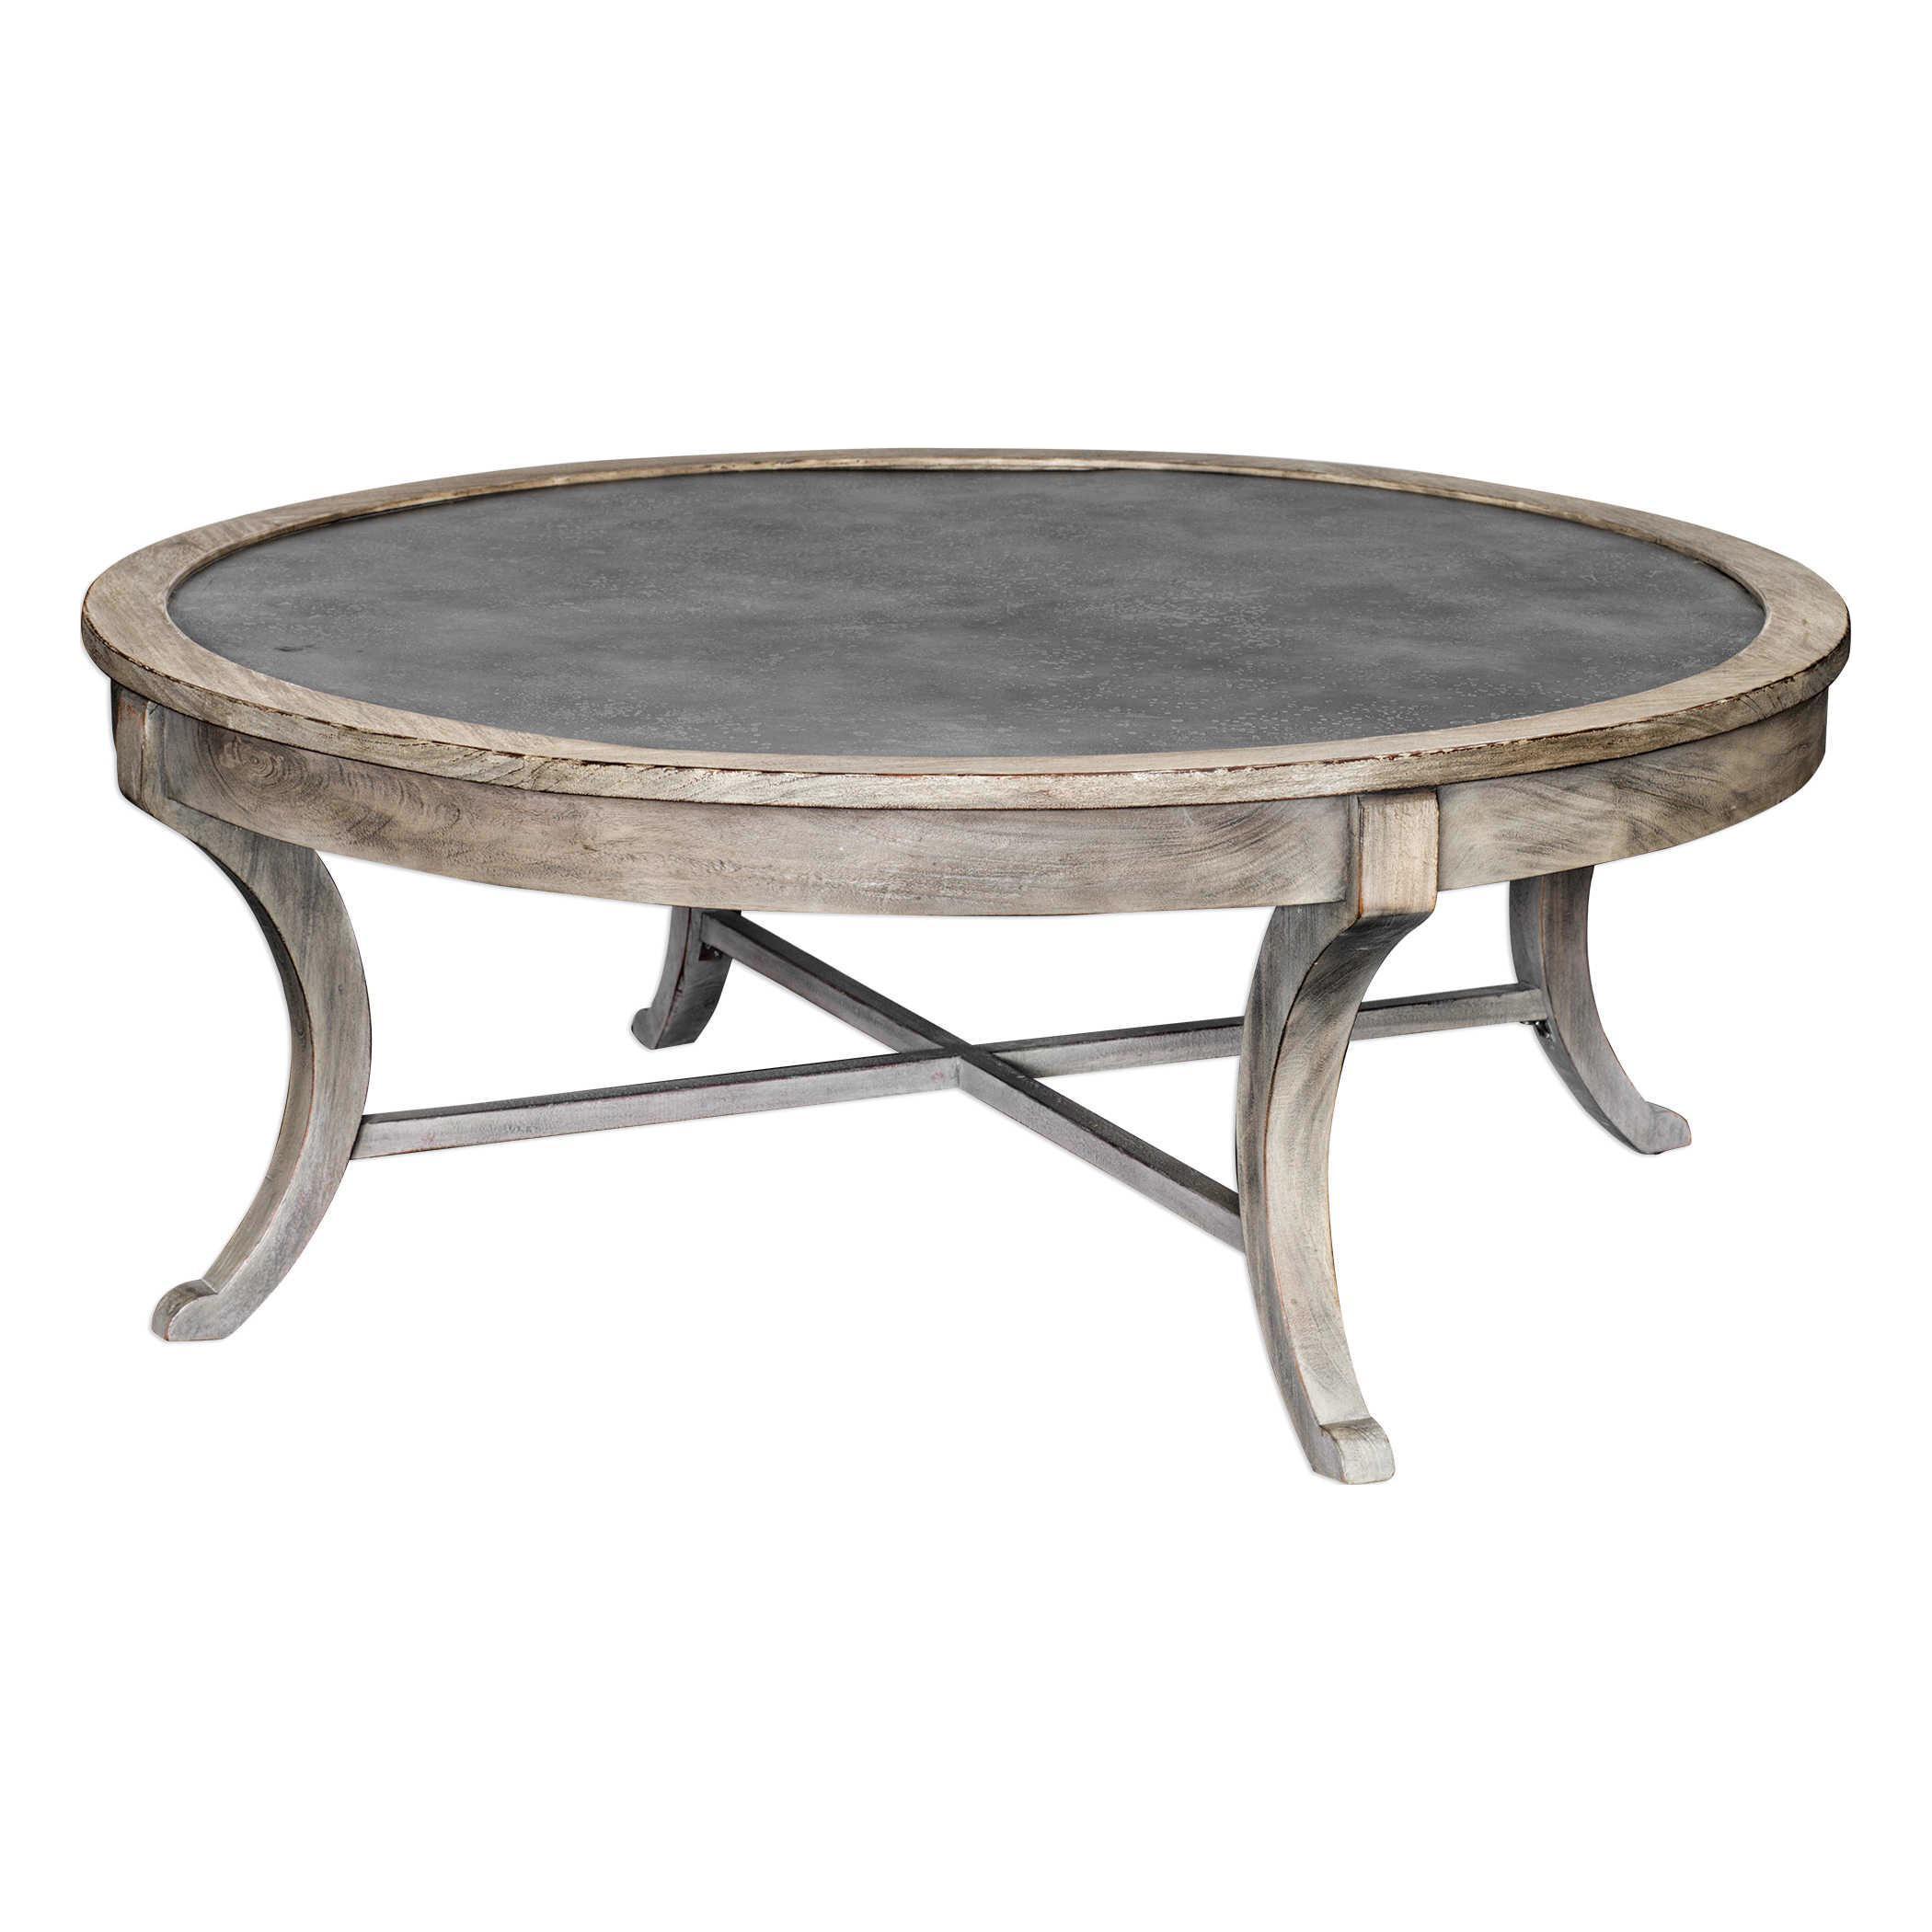 - Distressed Mahogany Round Coffee Table Chairish